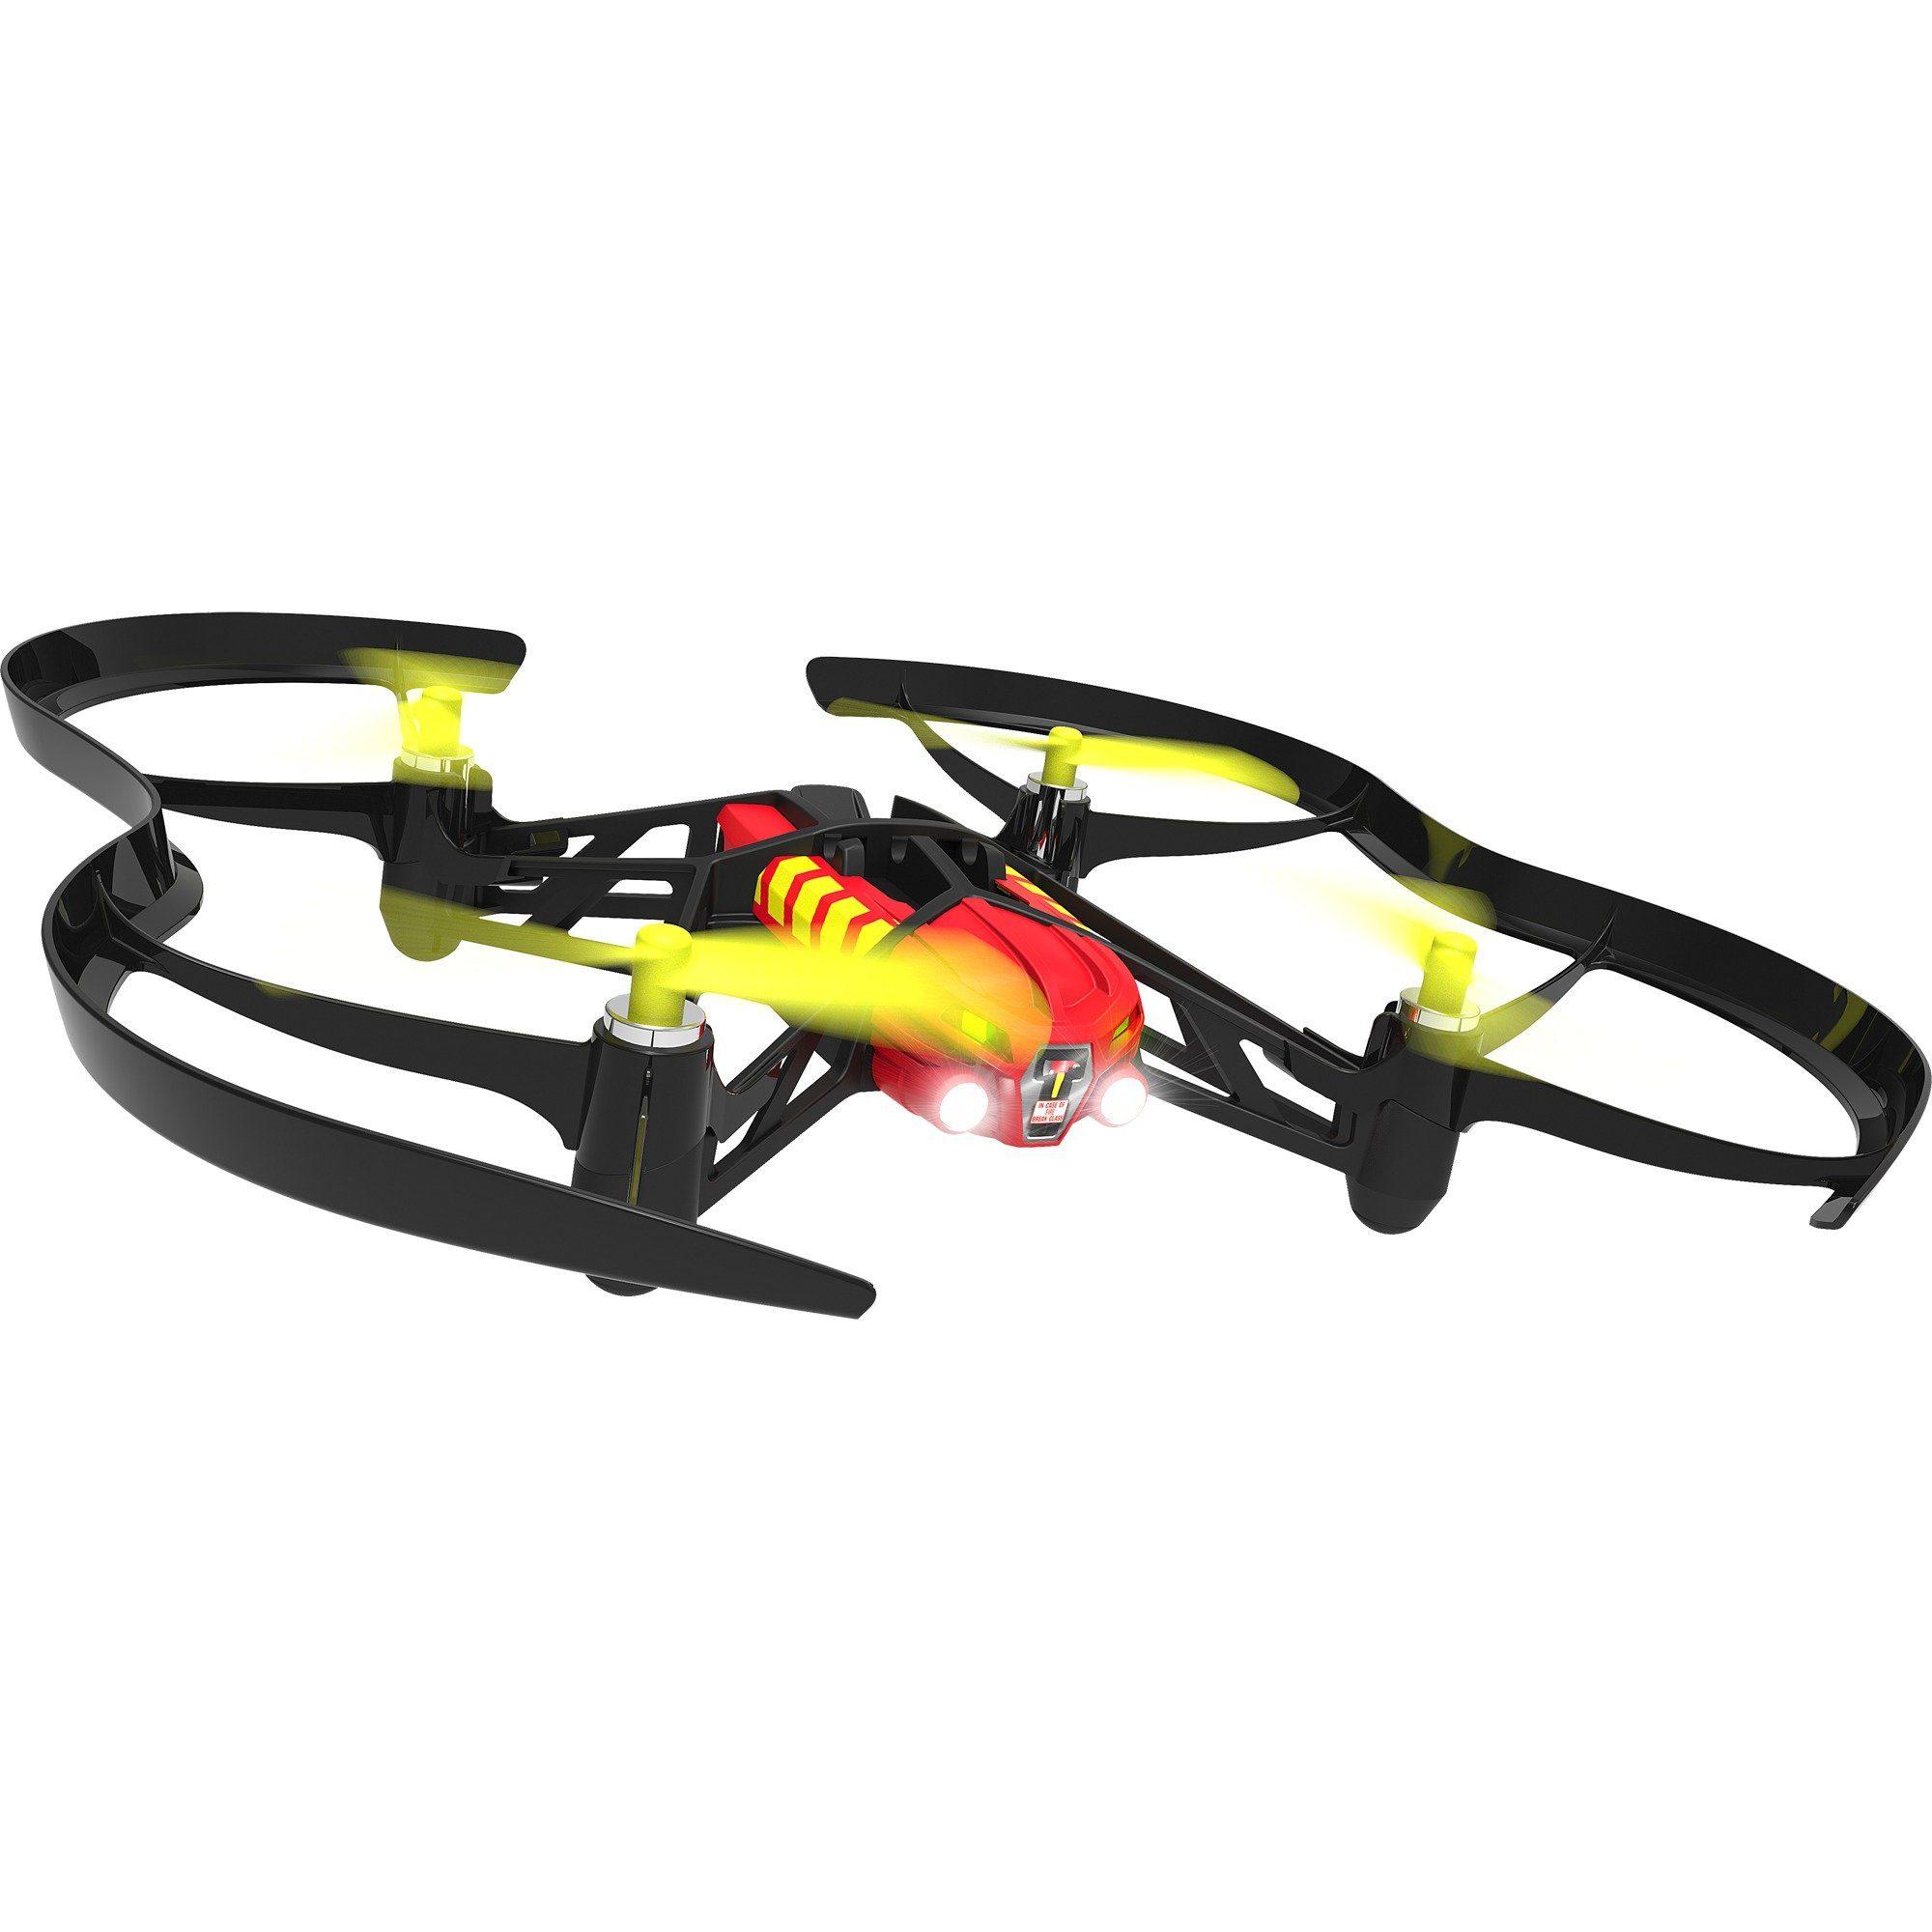 Parrot Drohne »MD AIRBORNE NIGHT DRONE Blaze«